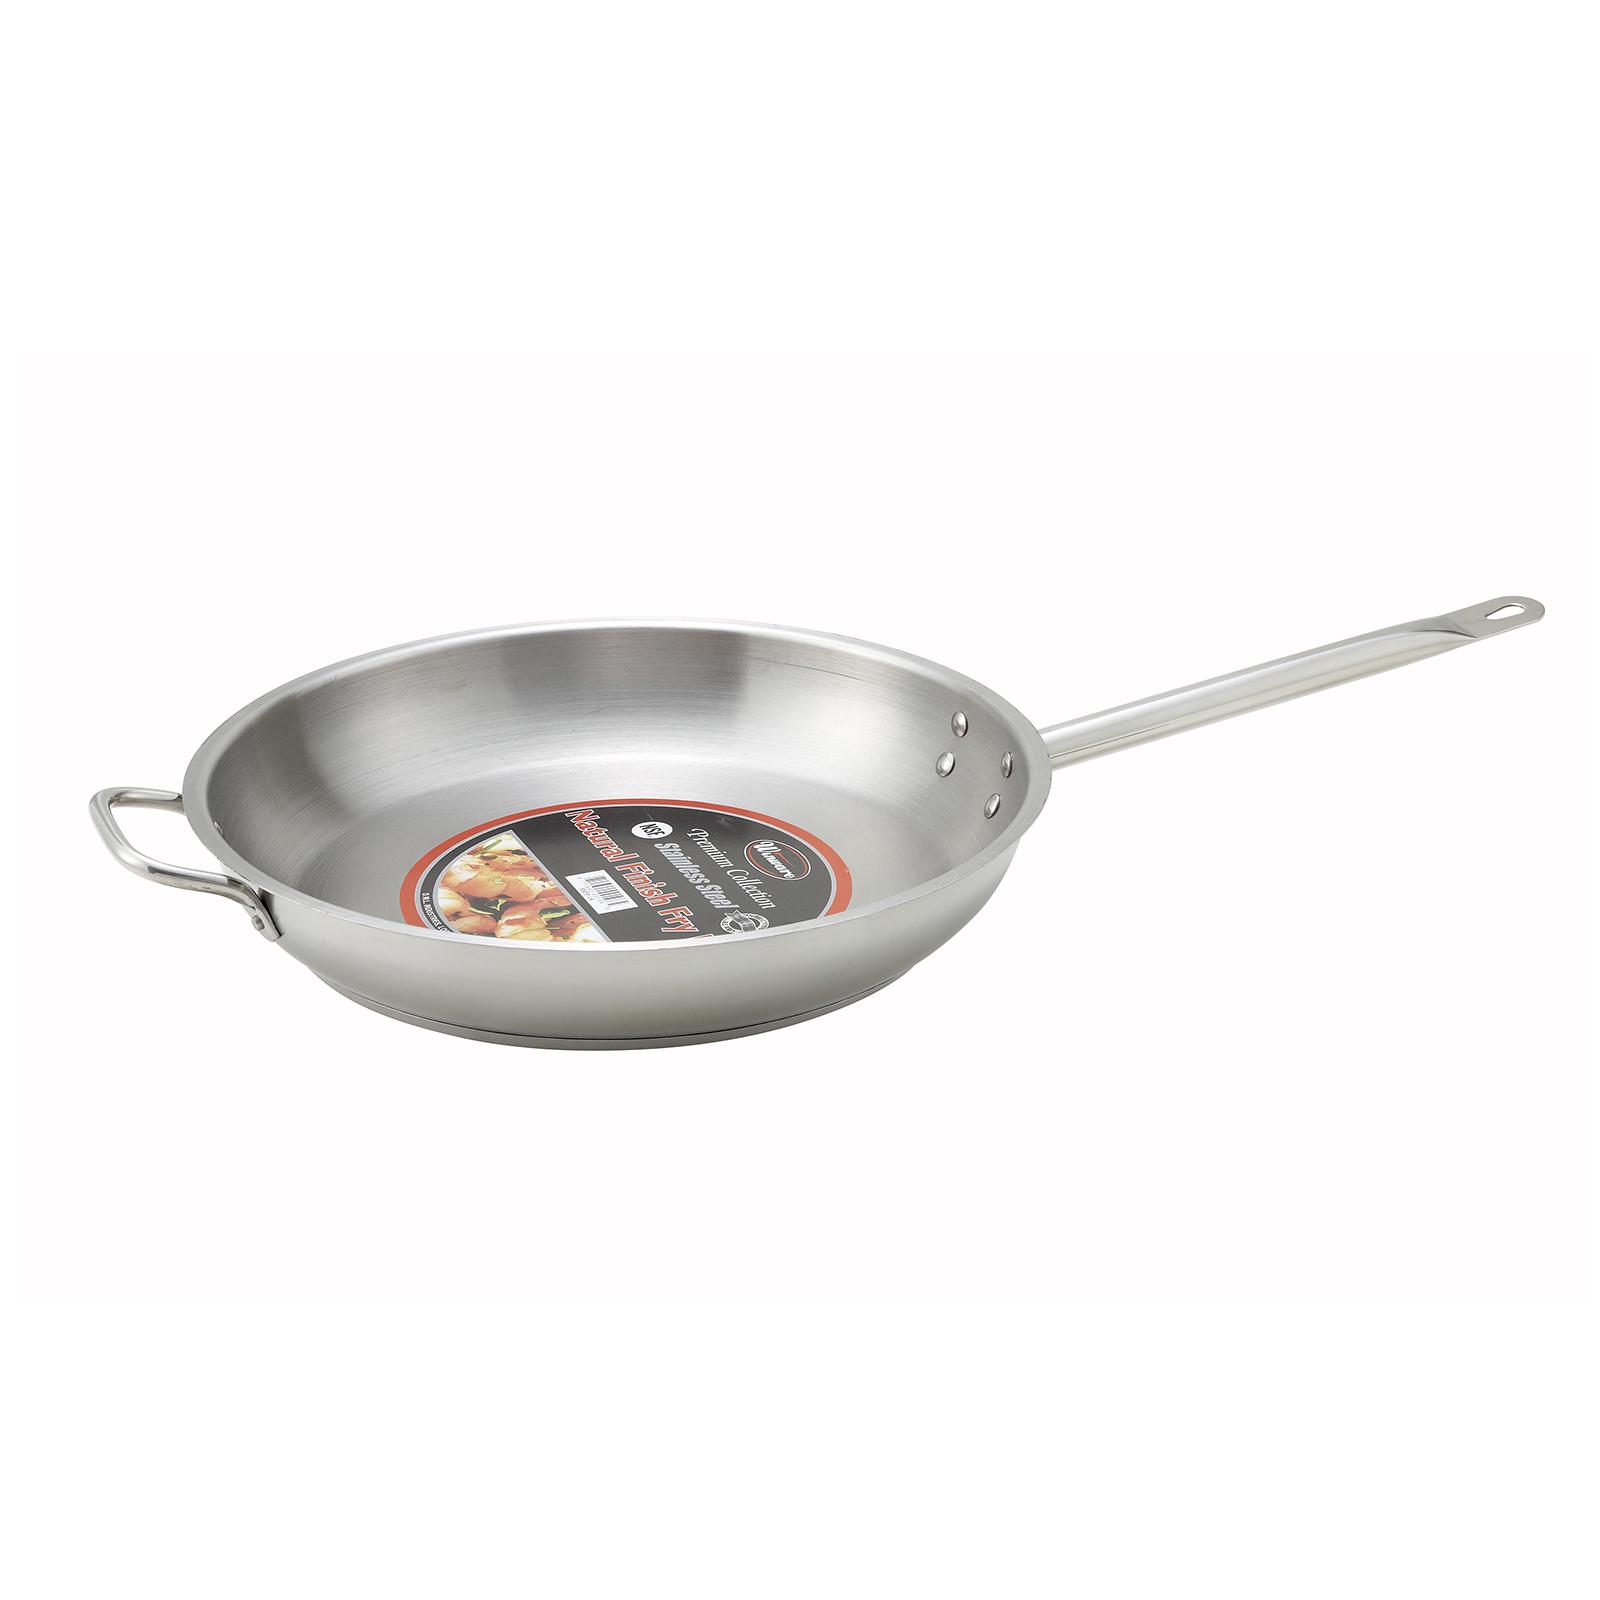 1000-76 Winco SSFP-14 fry pan